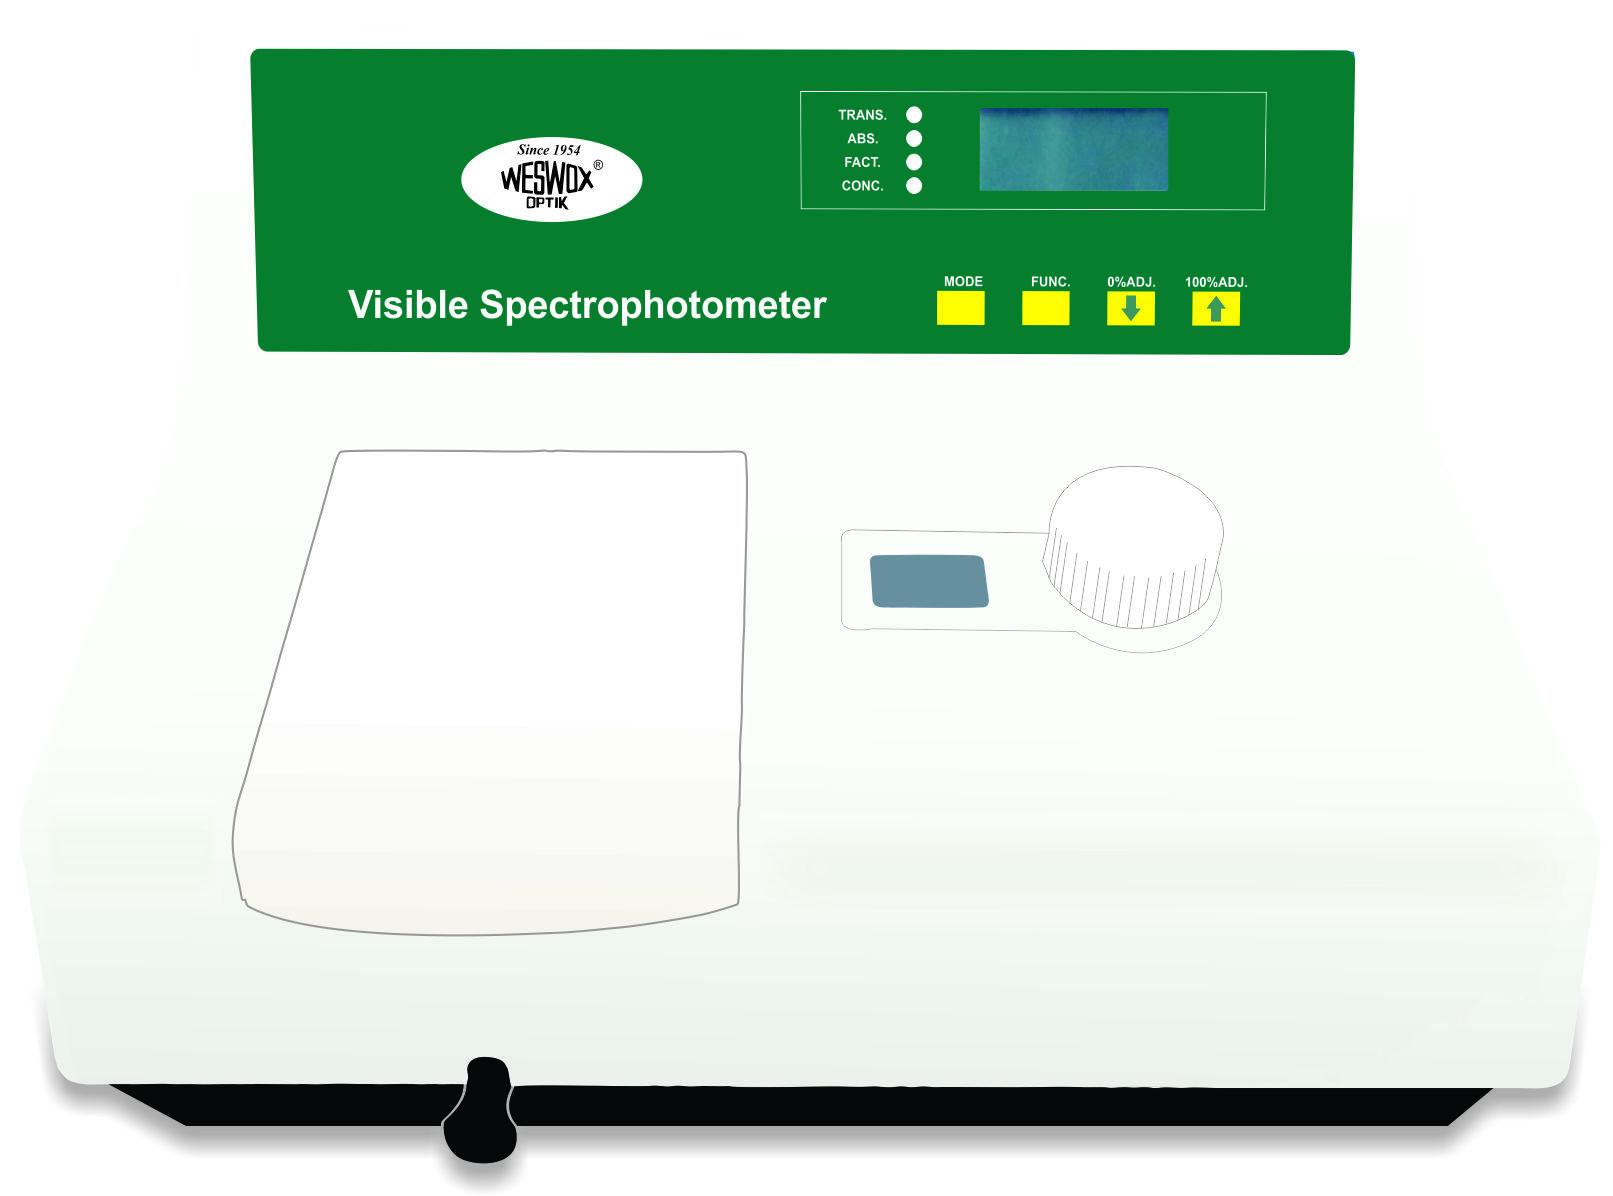 VISIBLE SPECTROPHOTOETER